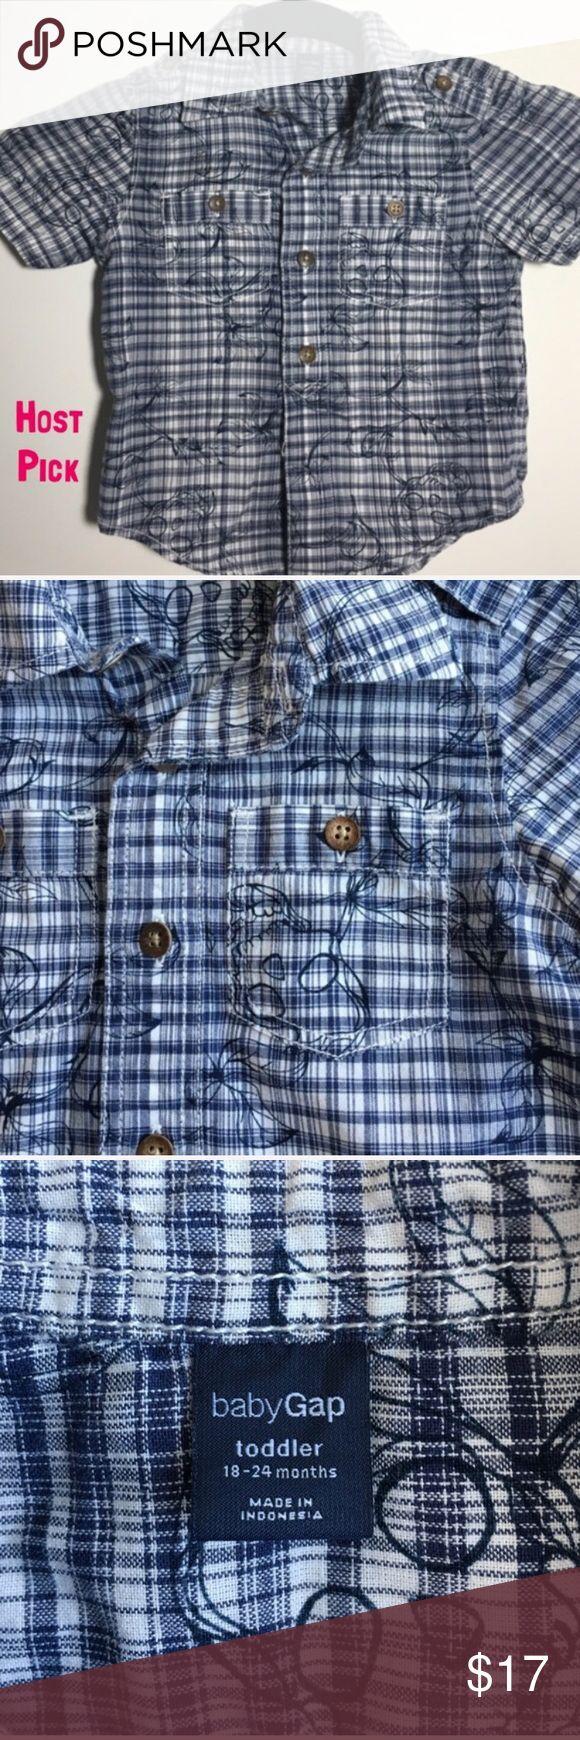 GAP skull short sleeve button down shirt ✨HP 12/22✨EUC!! Adorable boy's button down short sleeve shirt from baby gap. Skull and vine pattern. Looks so cute under a cardigan. GAP Shirts & Tops Button Down Shirts